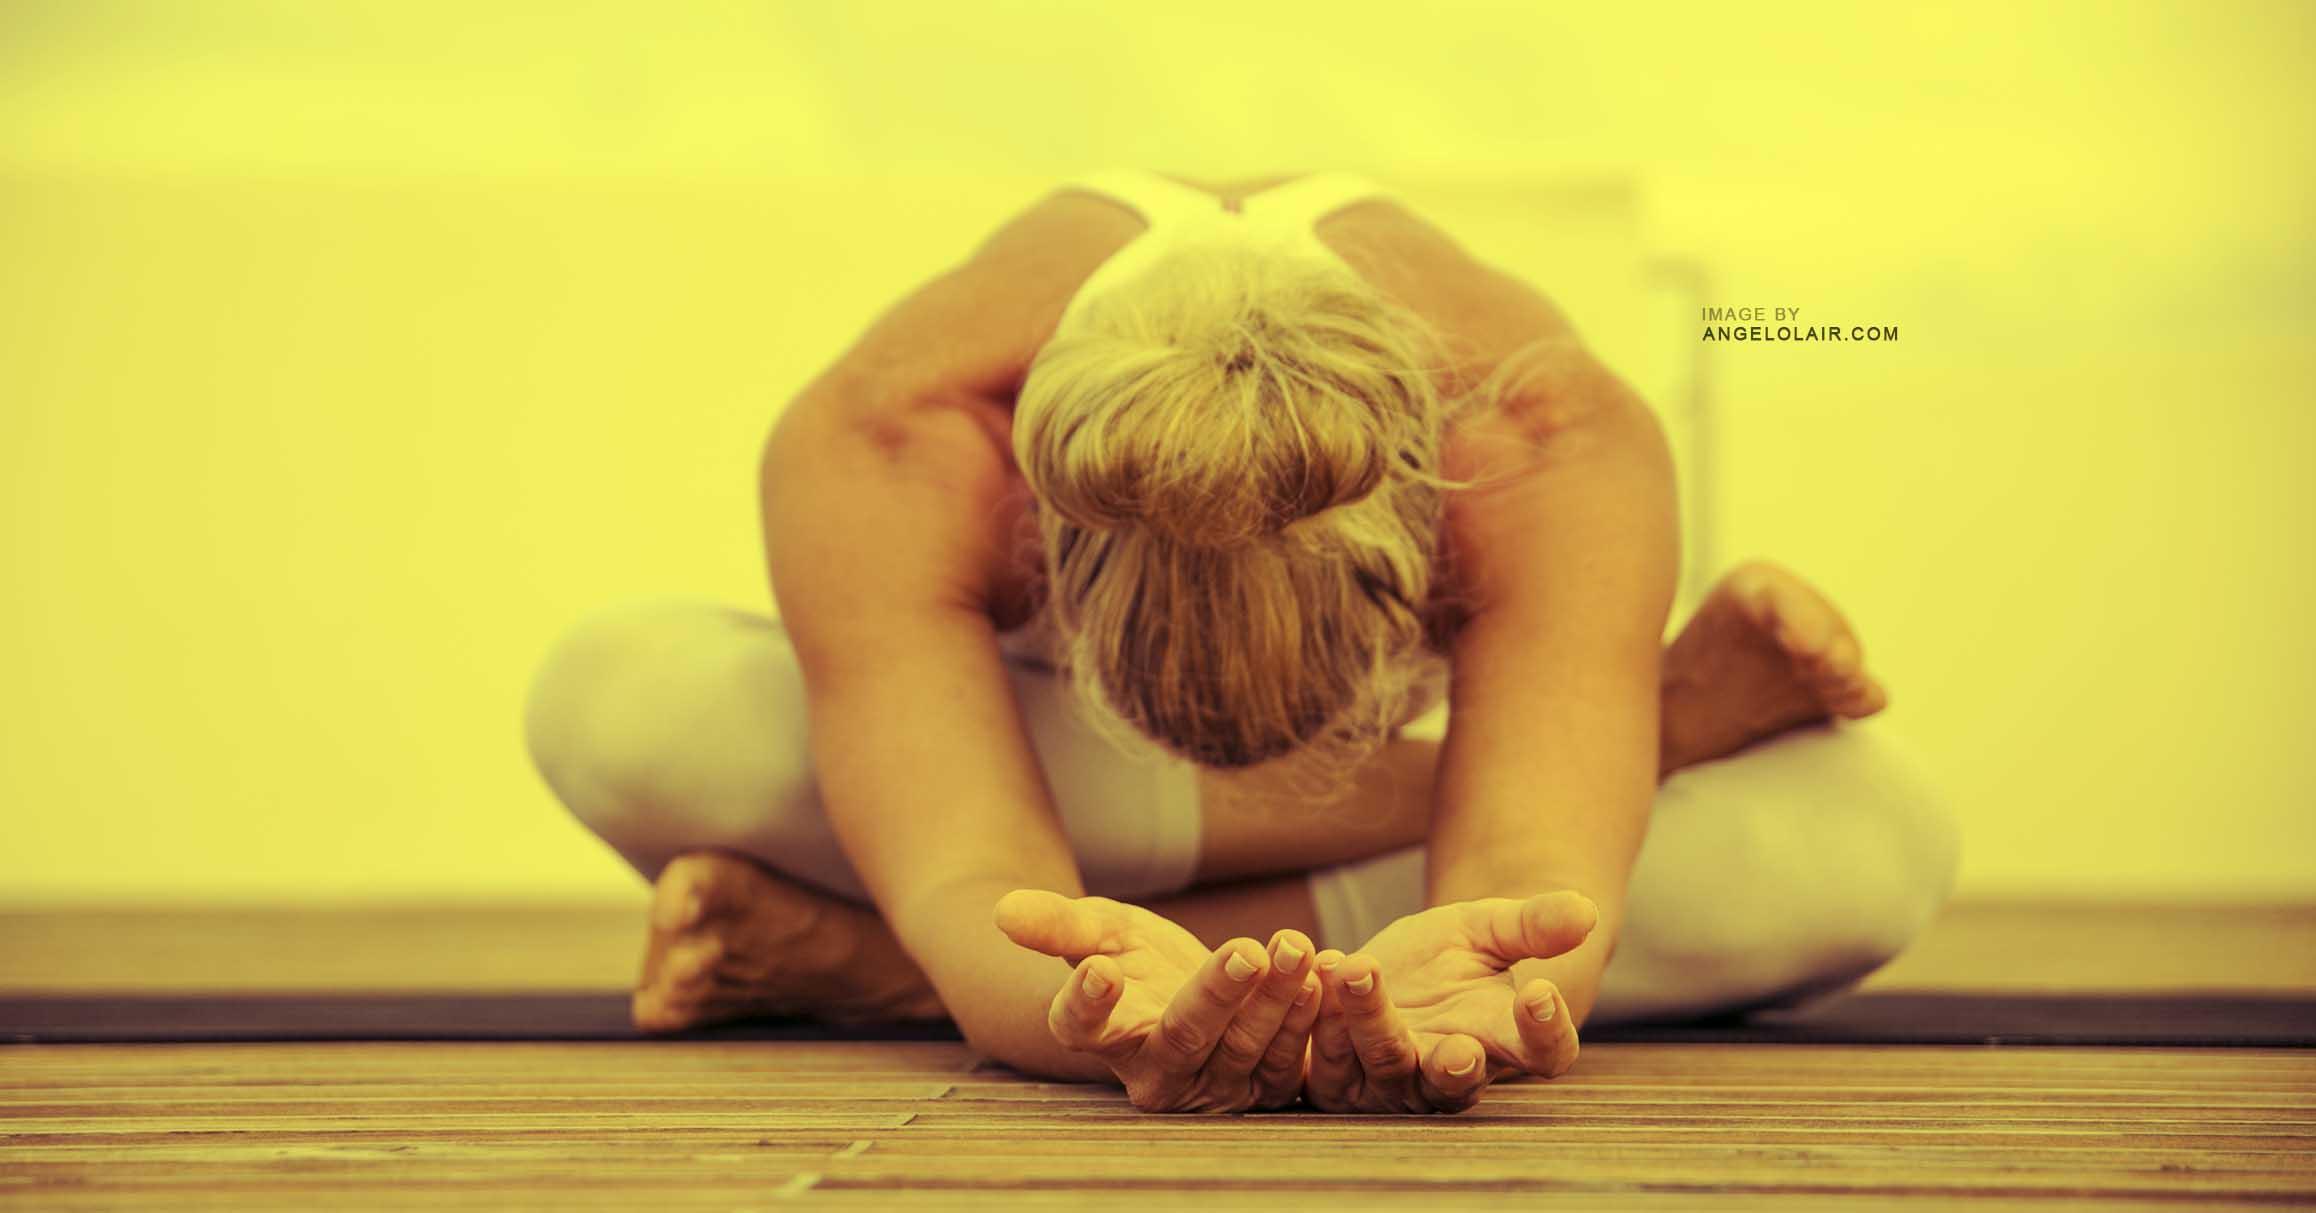 YOGA BADEN BEI WIEN - Yin Yoga ist Hingabe an den Moment, ohne Bedingungen